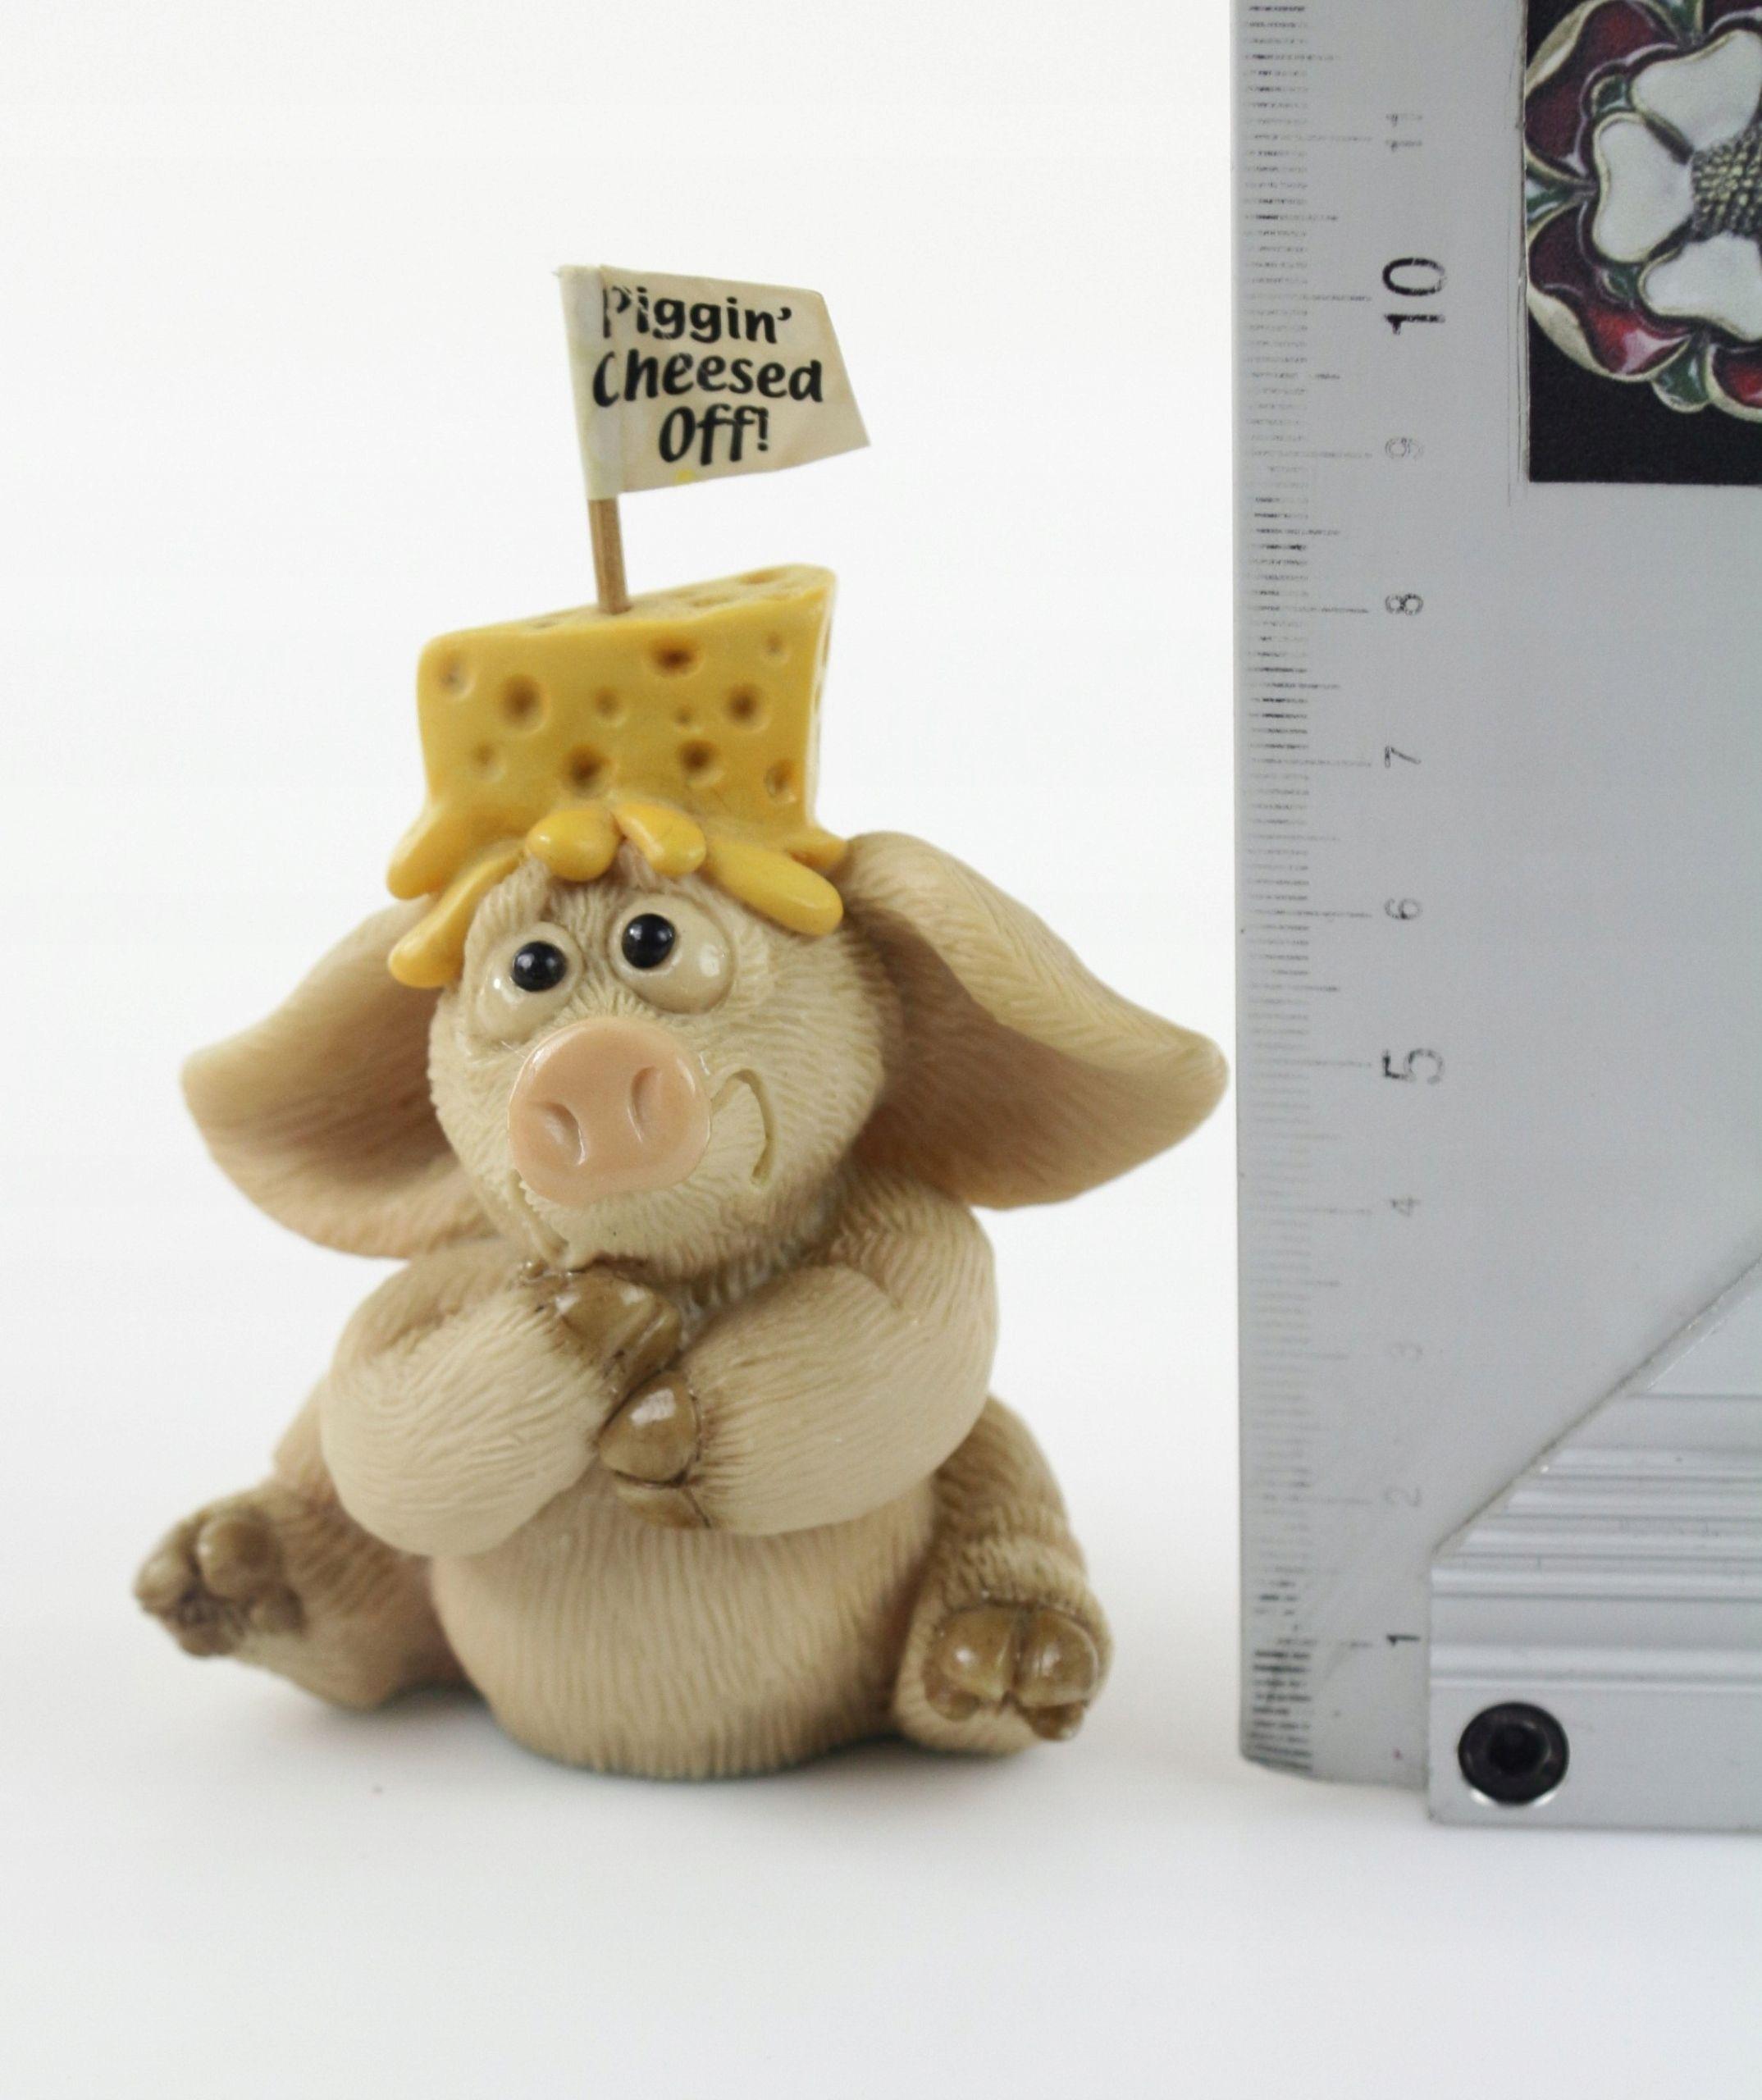 Pchli Targ Figurka Swinka Piggin Pchli Targ Antyki I Aukcja